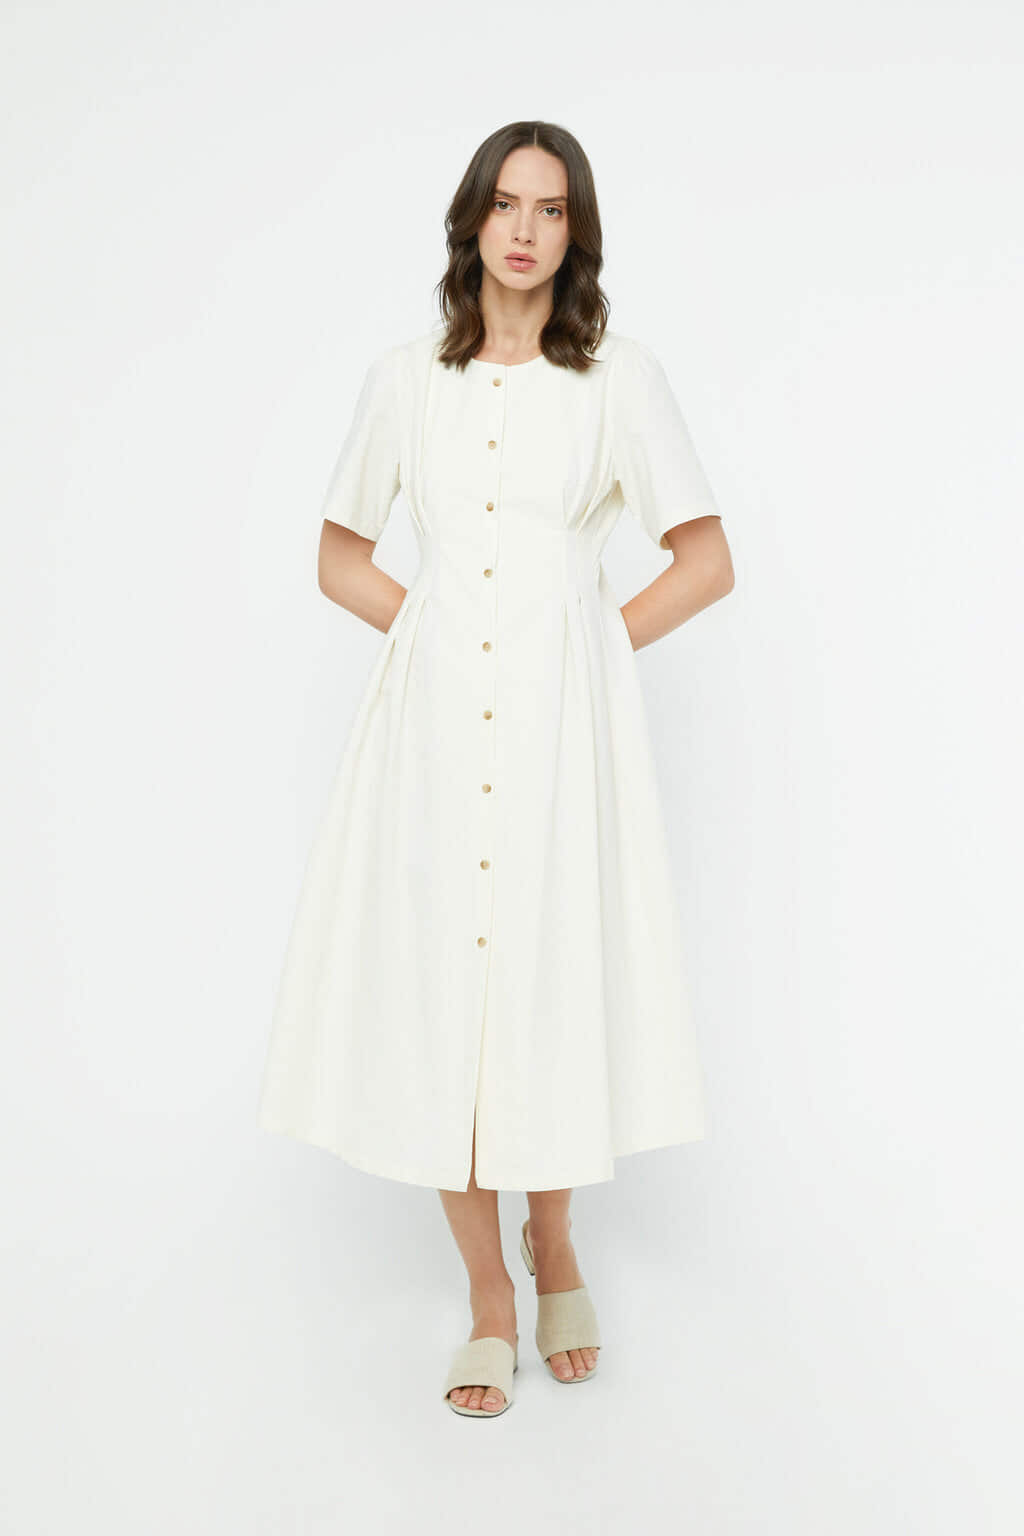 Dress K011 Cream 3